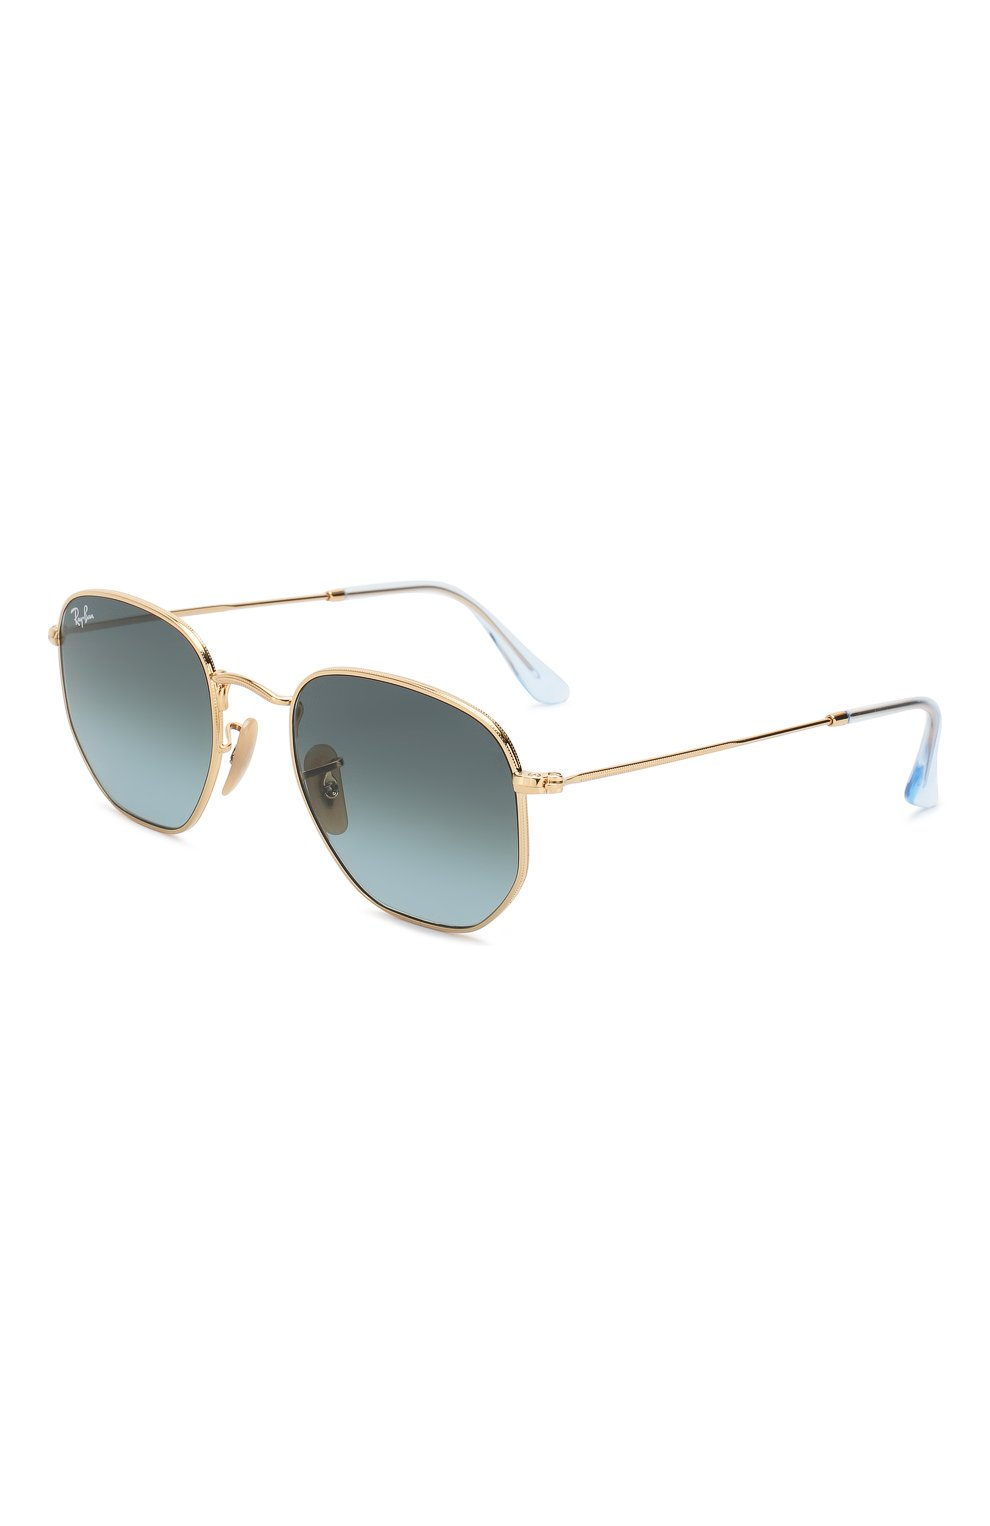 Женские солнцезащитные очки RAY-BAN голубого цвета, арт. 3548N-91233M | Фото 1